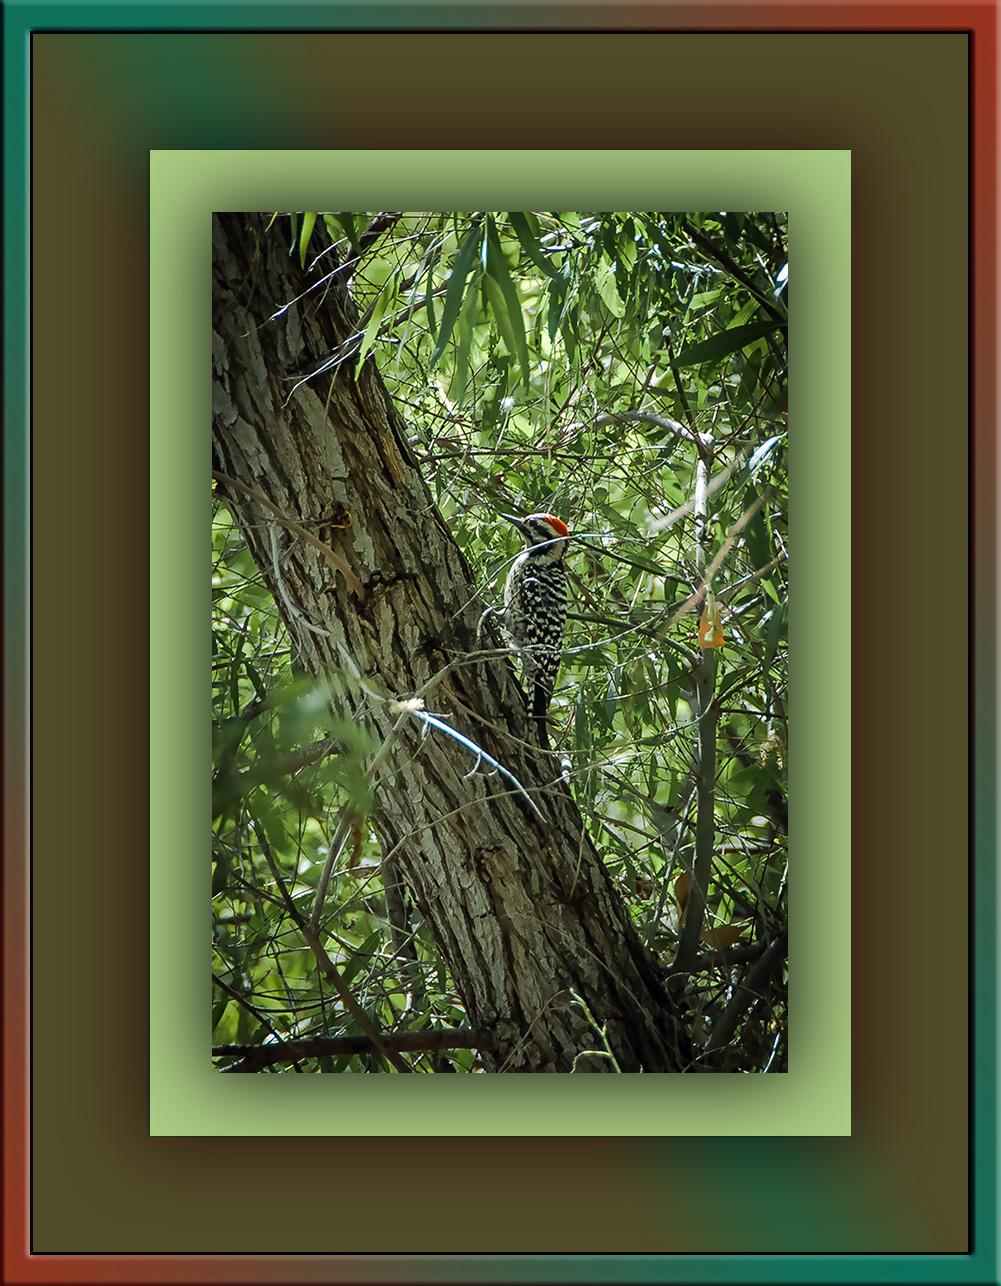 Ladder-backed Woodpecker (1 of 1) blog